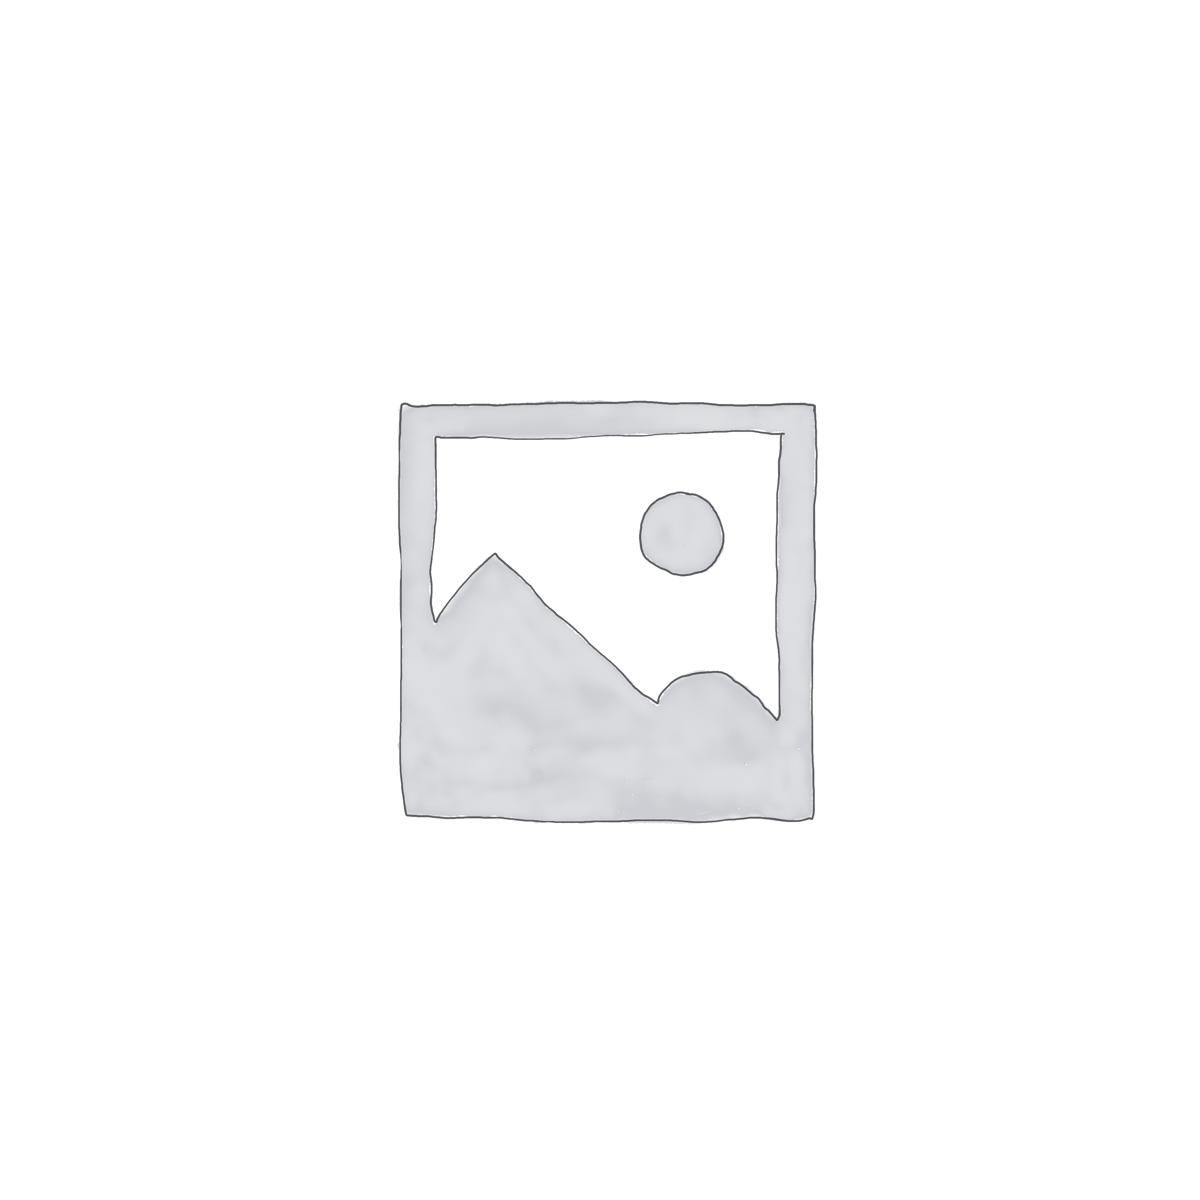 Буферен съд Елдом, 80л., Емайлиран, модел:BCE 80